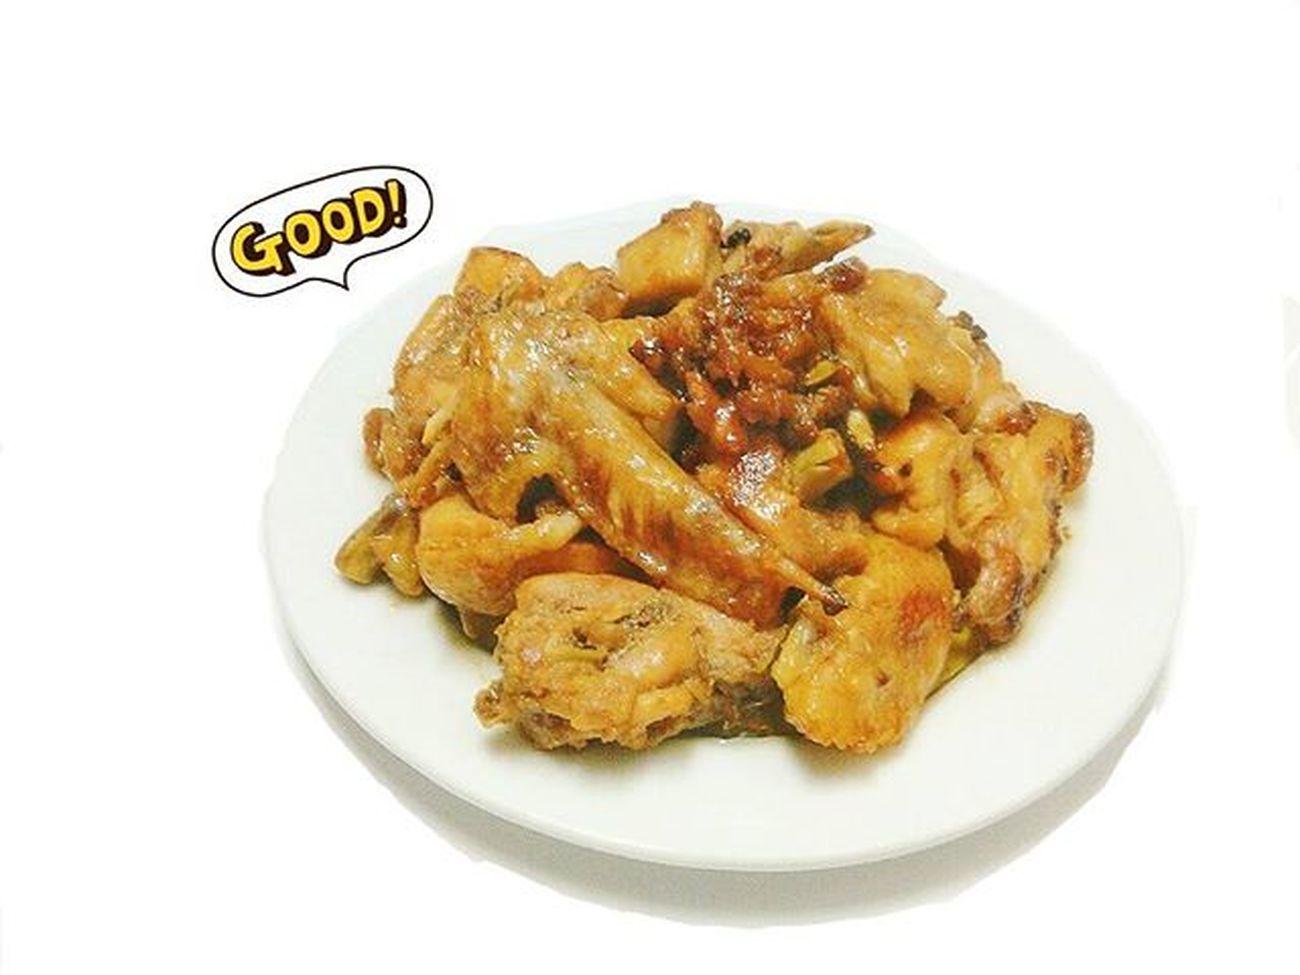 Được hôm hiền lành đi làm gà rán 😌😌 Friedchicken So Delicious Superngon 😂 Madebyme Great Interesting Homemade Verygood MyFavorite  Myhome Love Cooking For Dinner Loveit Saturday Weekend 🙈🙈👍👍❤❤💋